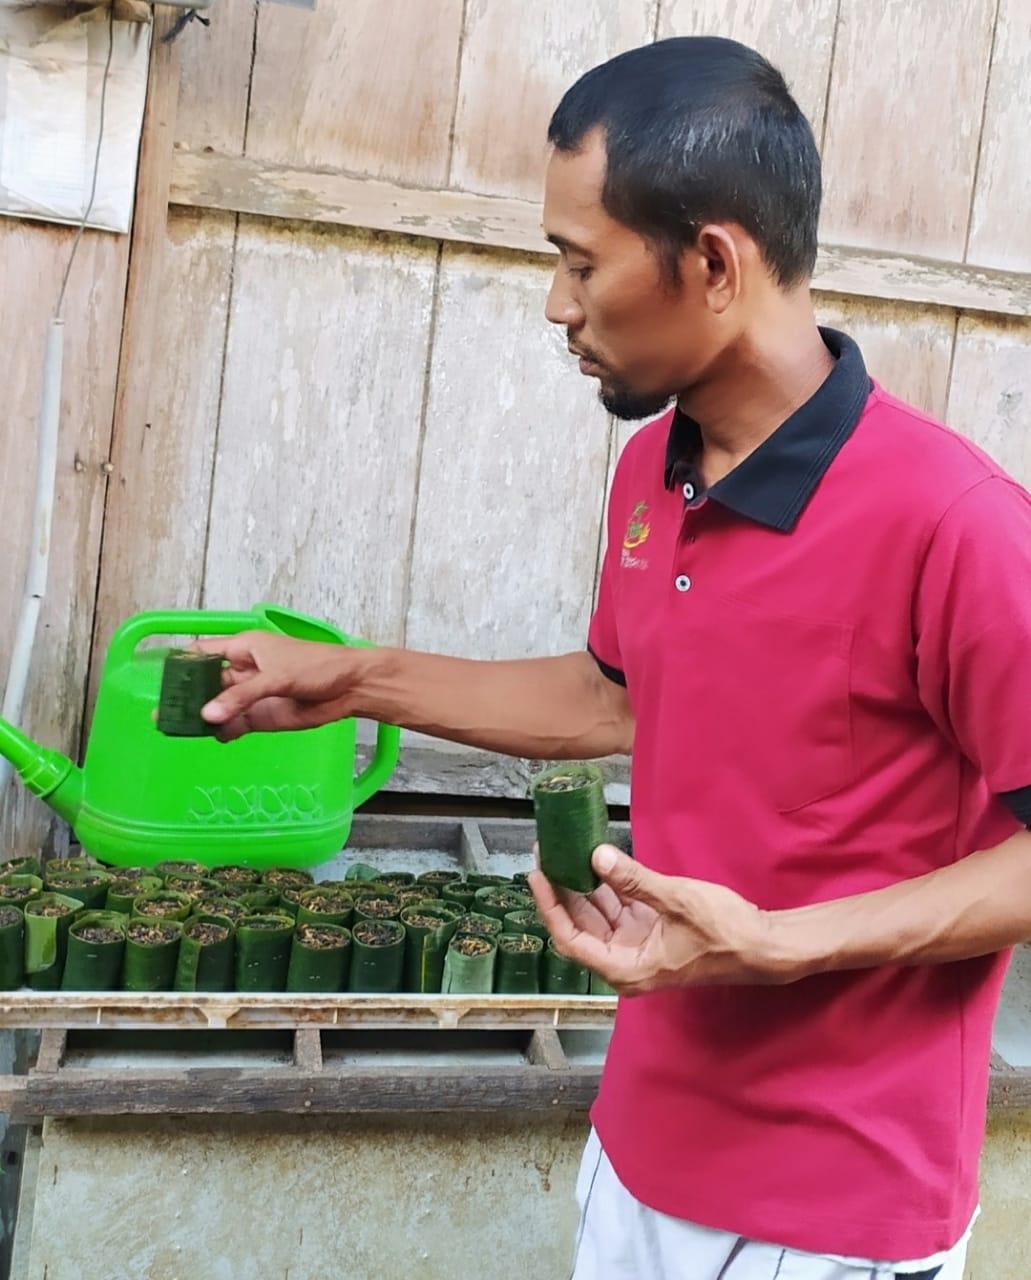 GREEN POLYBAG : MURAH, MUDAH DAN RAMAH LINGKUNGAN